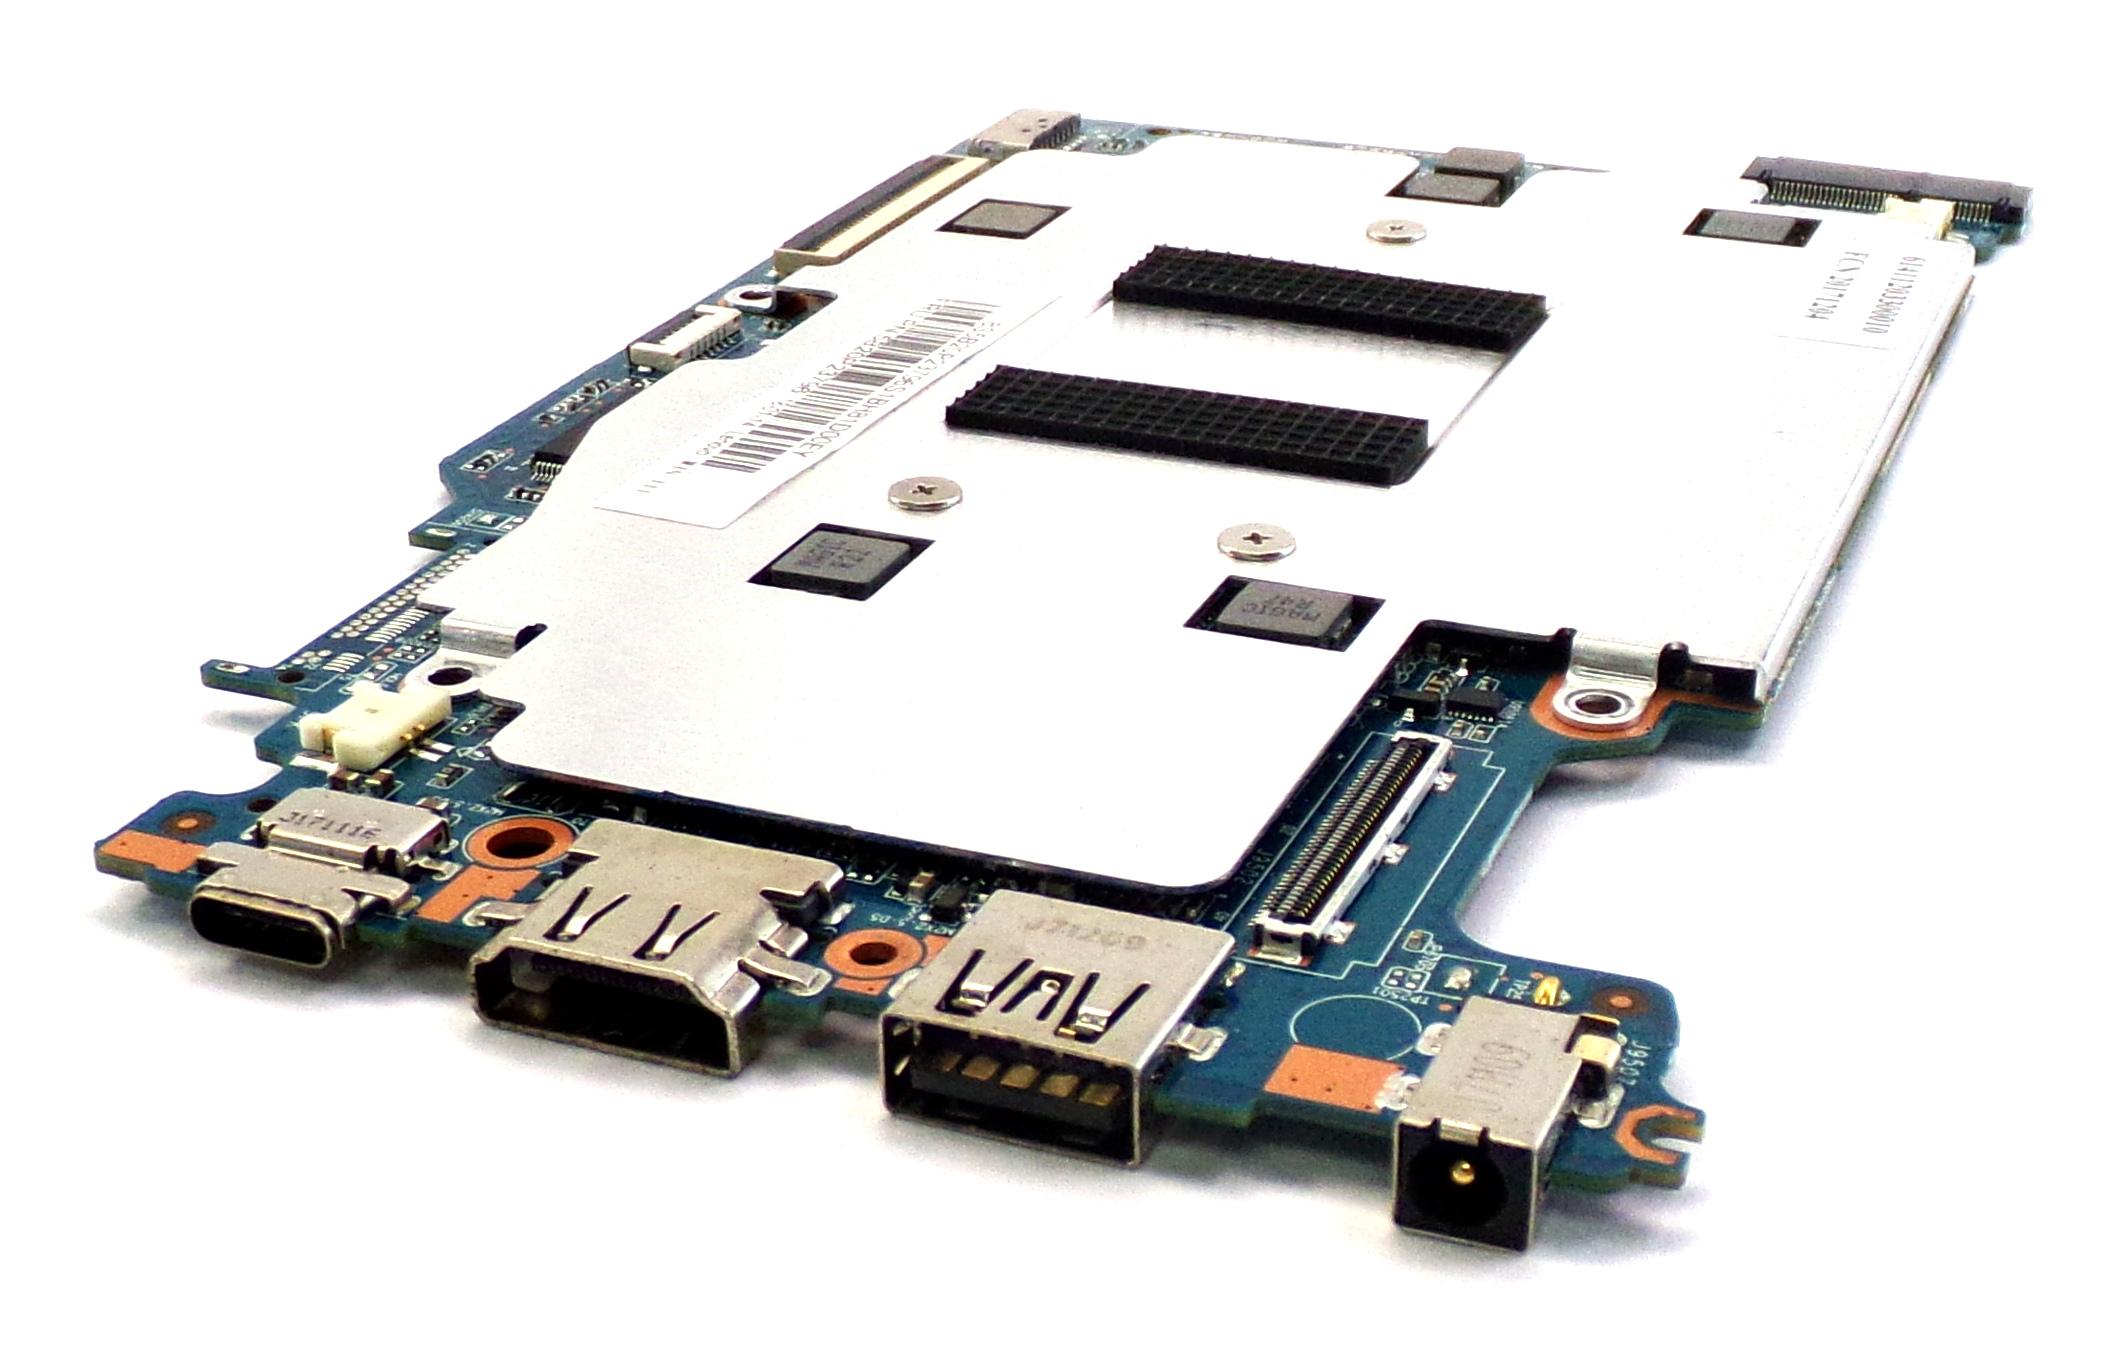 Lenovo 5B20P23796 Ideapad 120S-11IAP Celeron N3350 4GB 32GB Motherboard